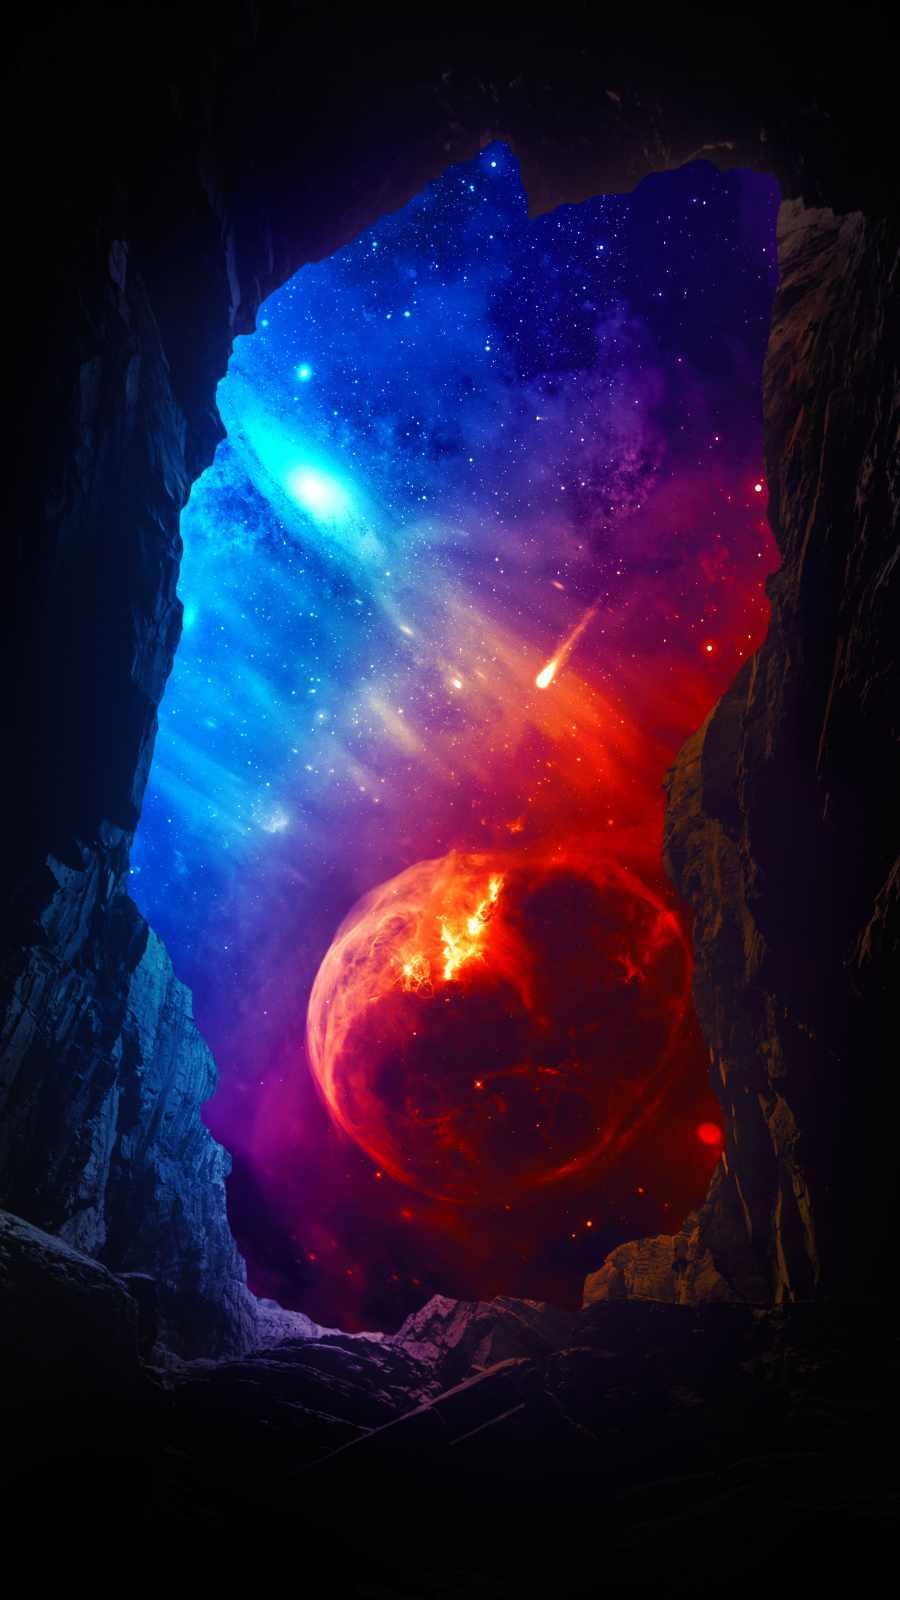 Nebula View into the Rocks